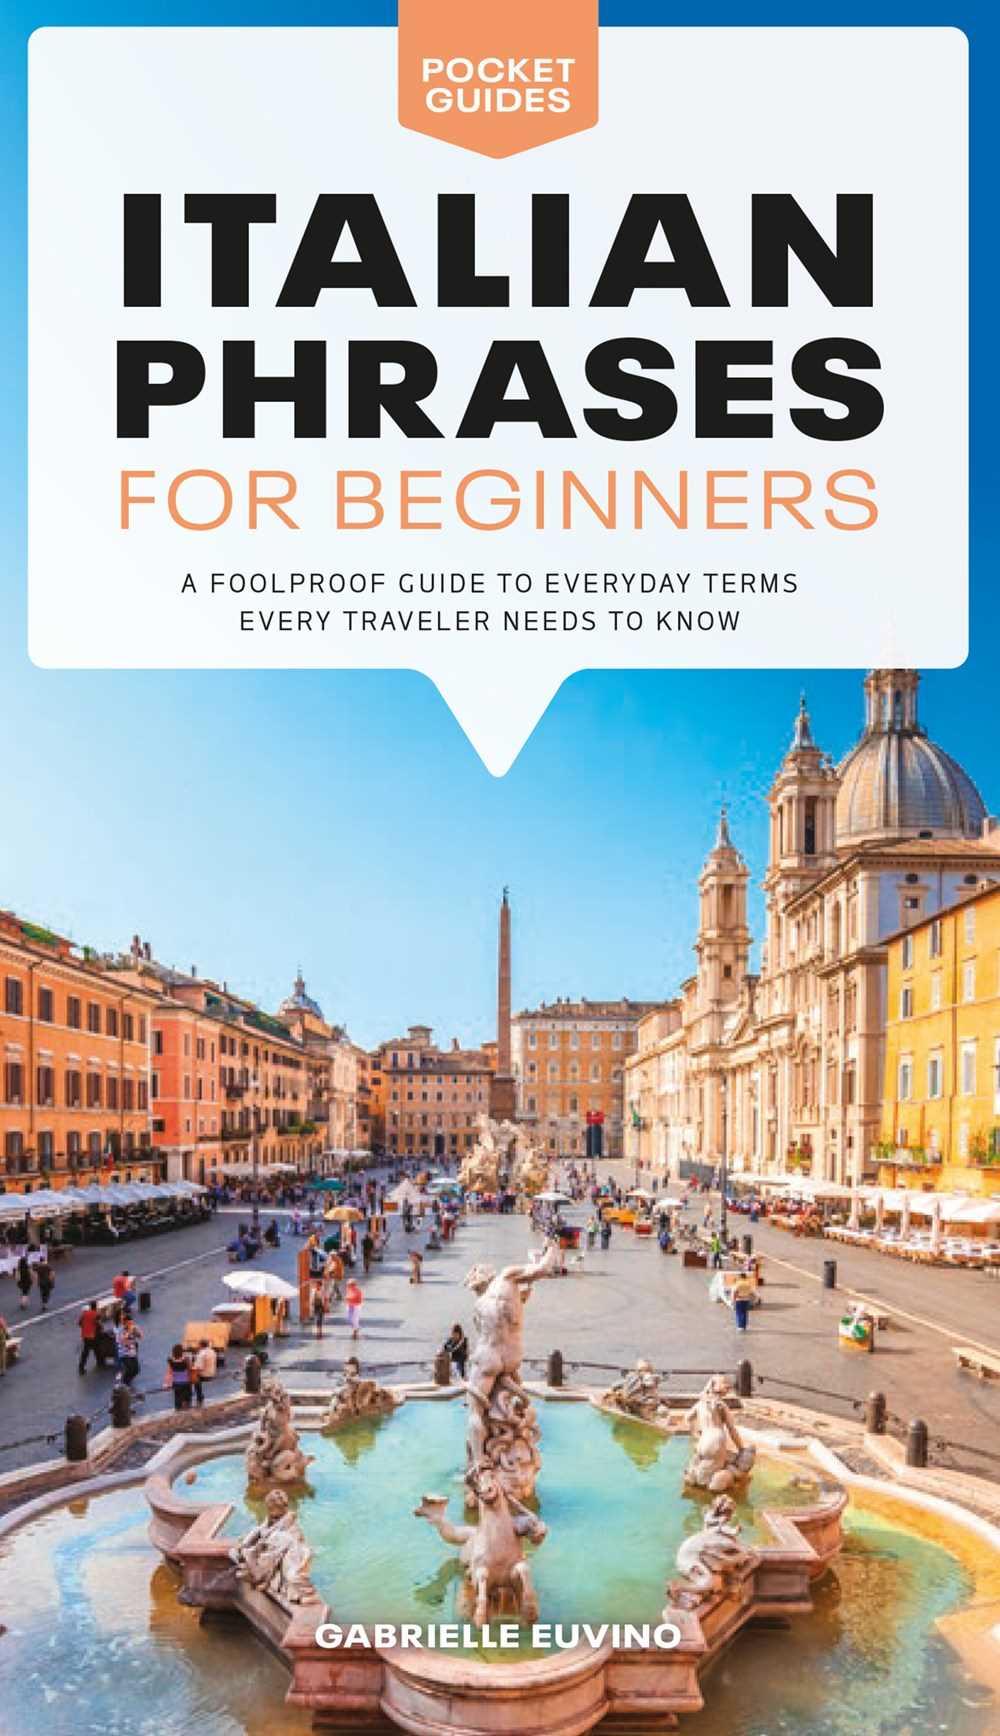 Pocket Guides: Italian Phrases for Beginners